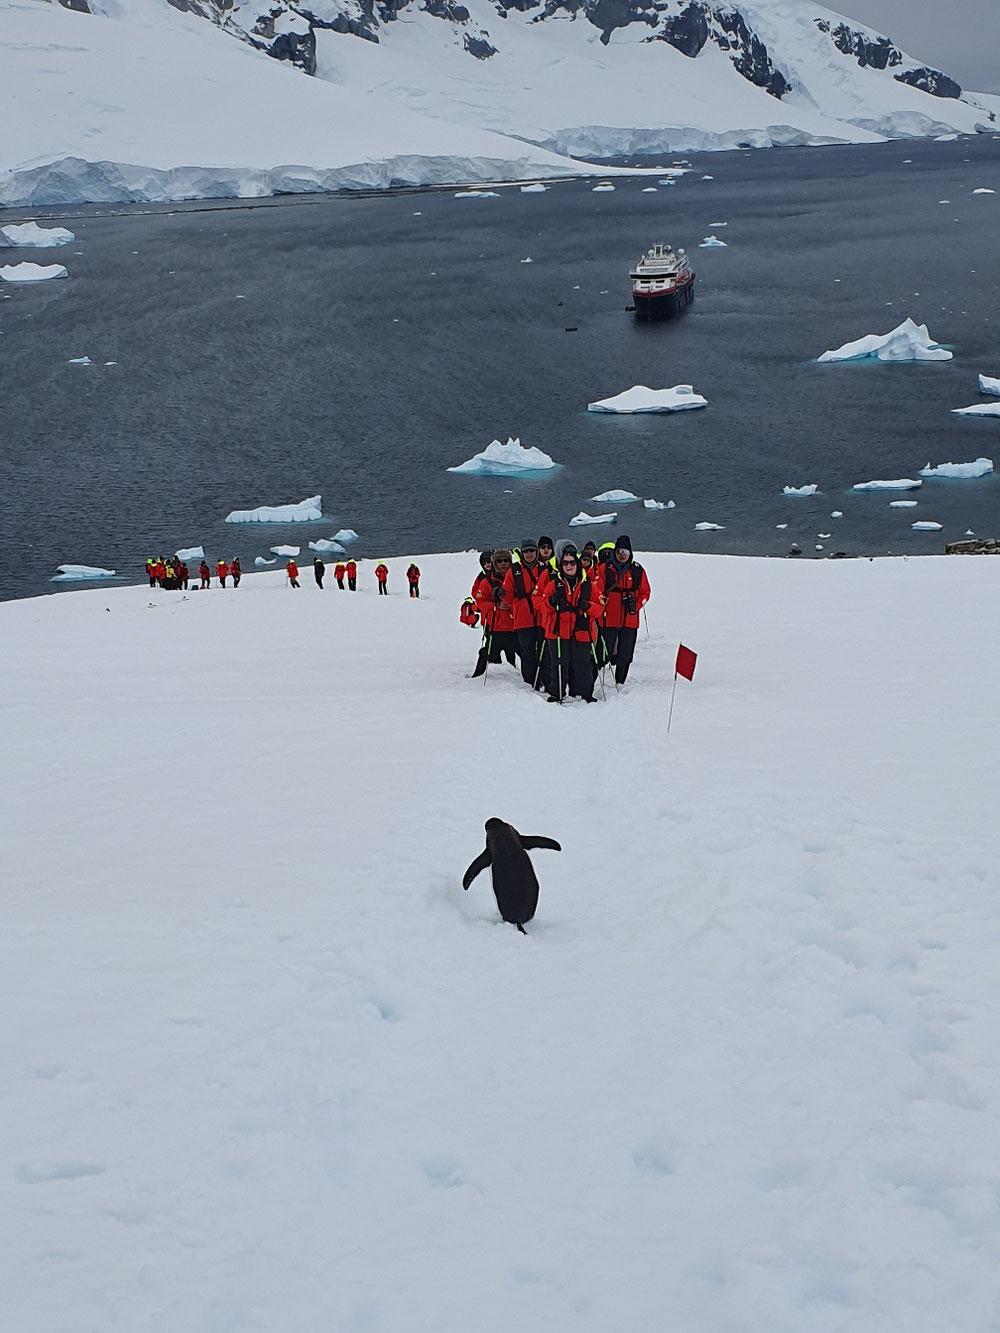 Pinguin regelt den Verkehr